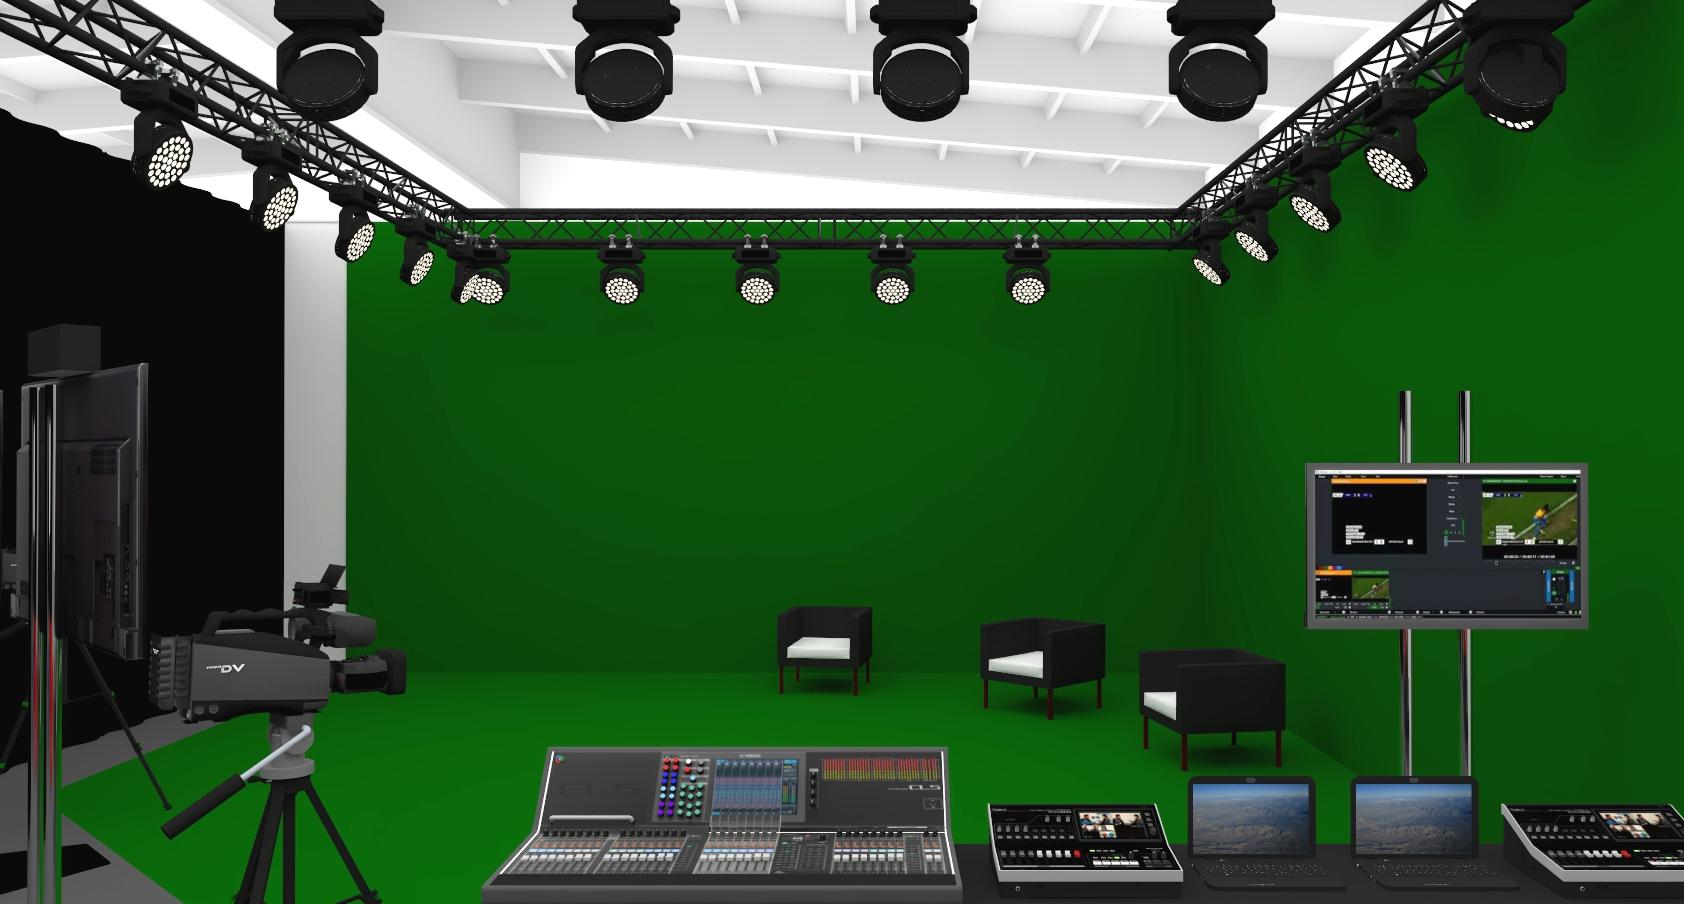 Professional organization of streaming